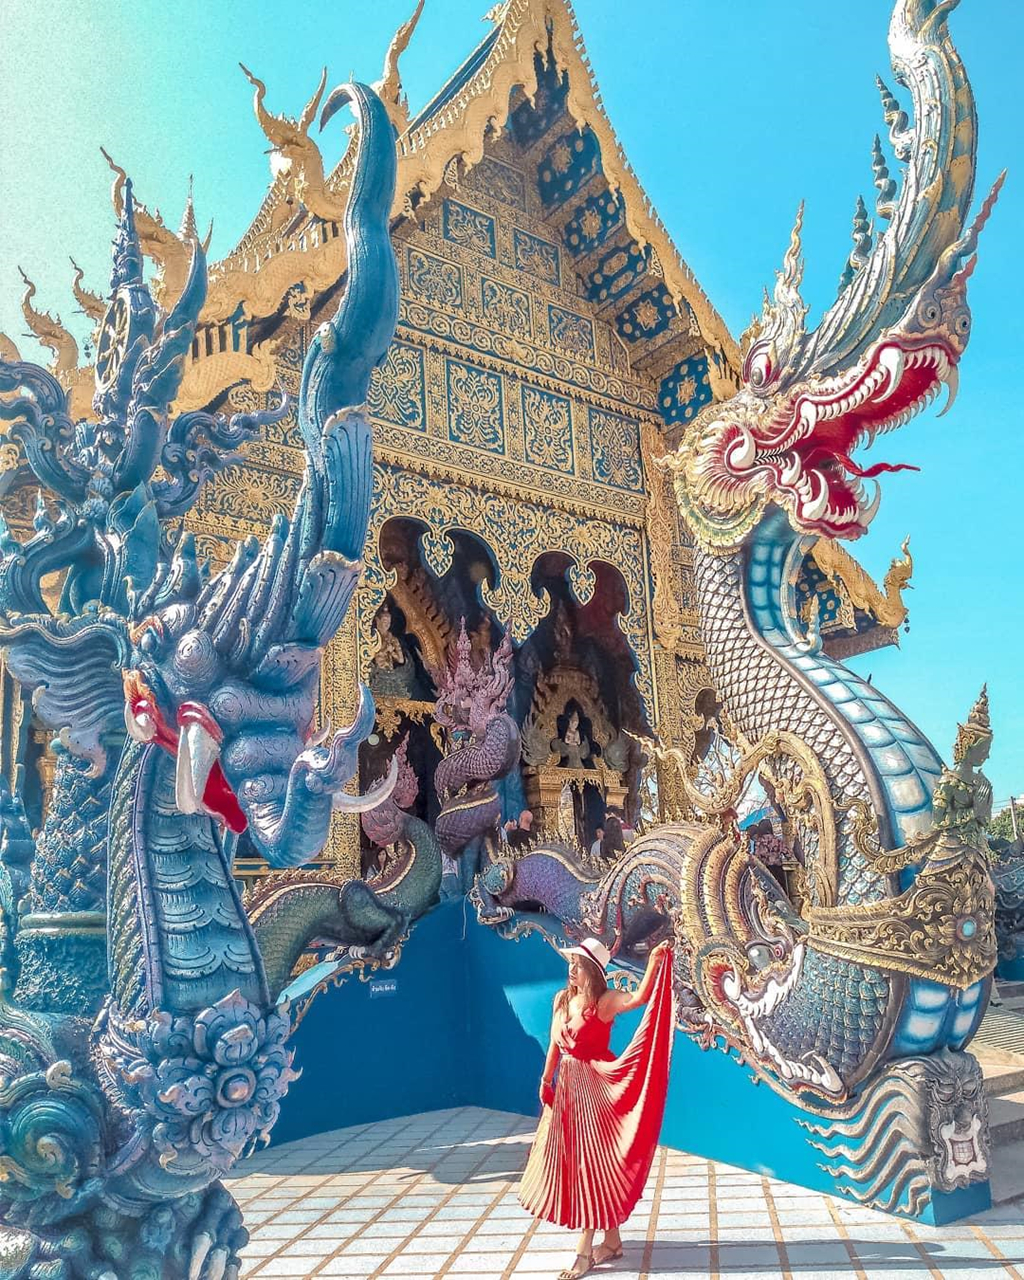 ghe-thai-lan-check-in-song-ao-tai-ngoi-chua-xanh-dat-vang-sang-chanh-ivivu-2